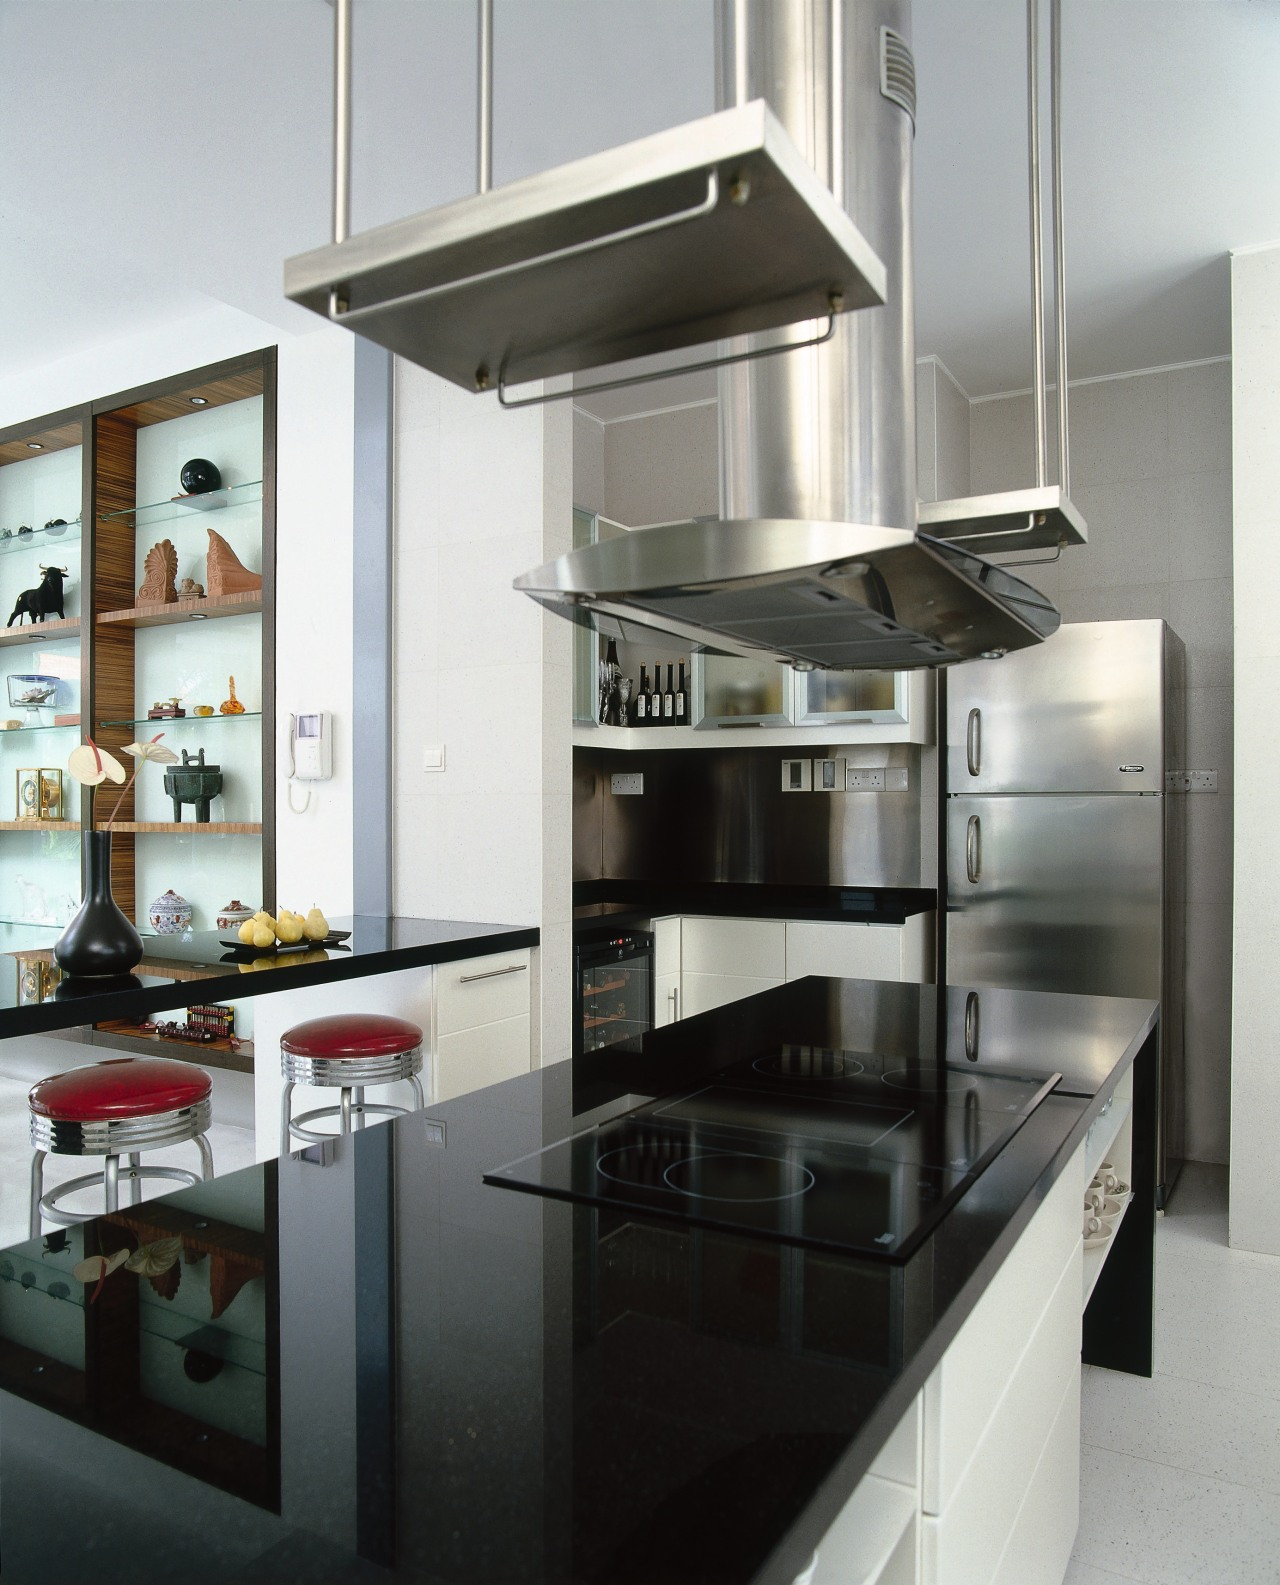 A view of the kitchen area, stone benchtops, countertop, home appliance, interior design, kitchen, kitchen appliance, gray, black, white